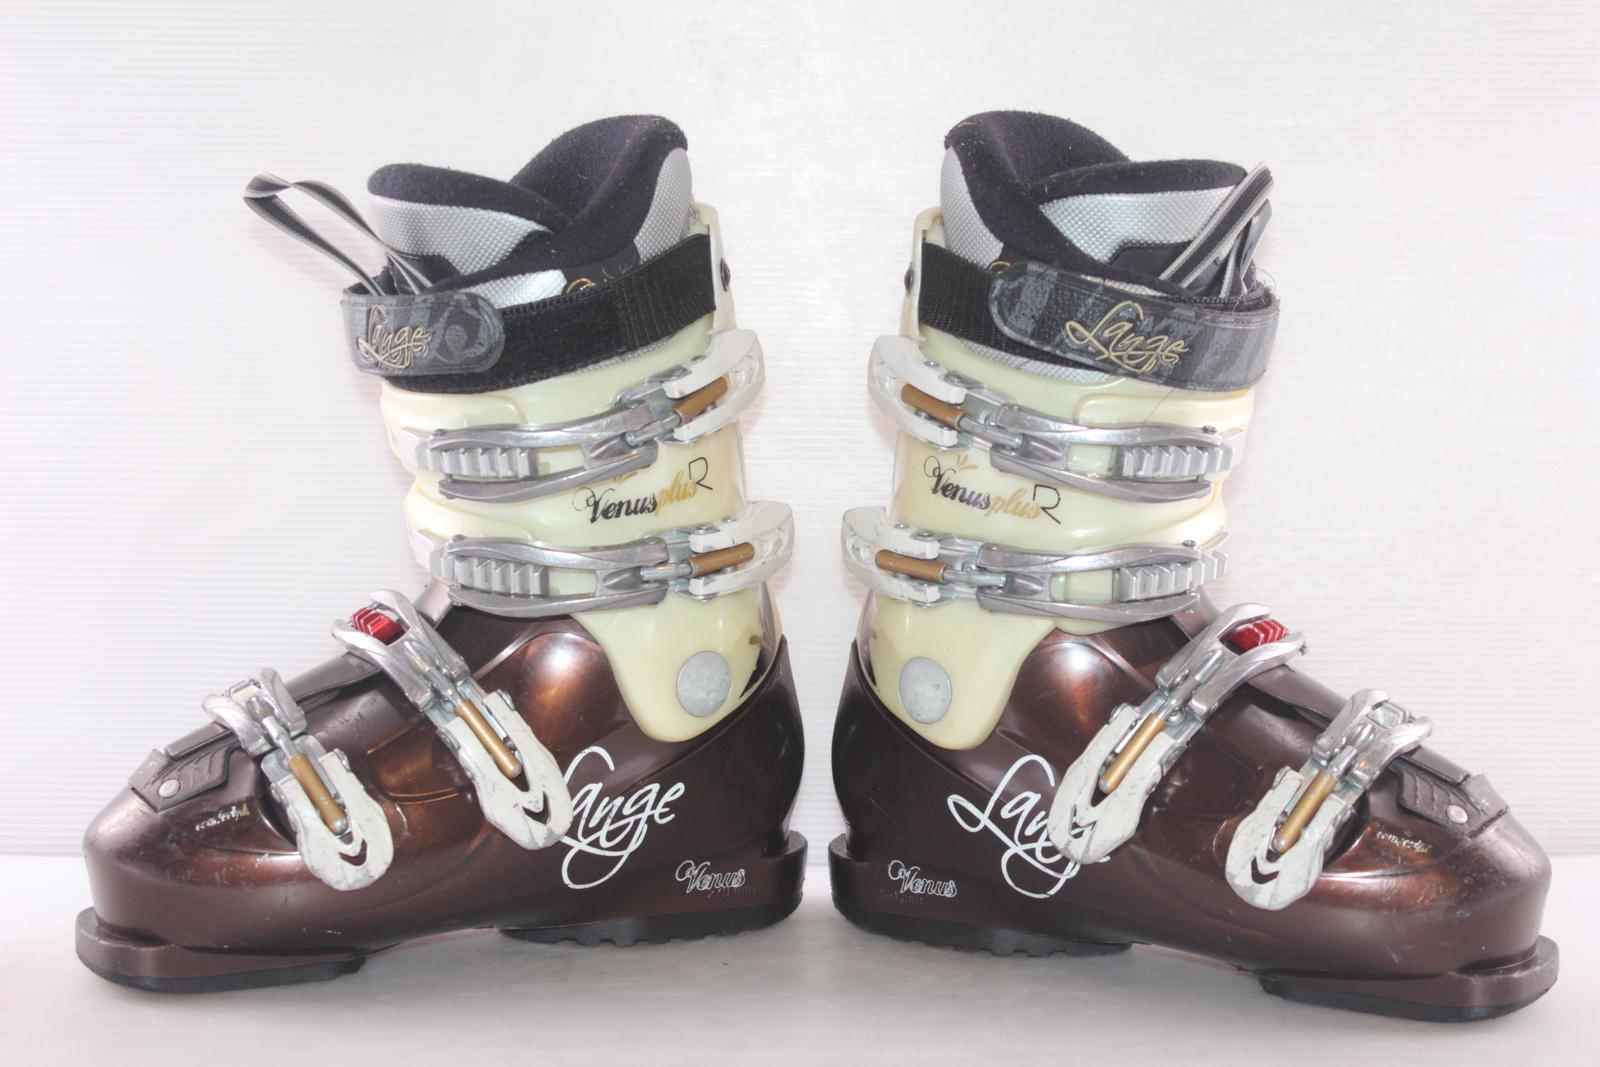 Dámské lyžáky Lange Venus plus R vel. EU37 flexe 70